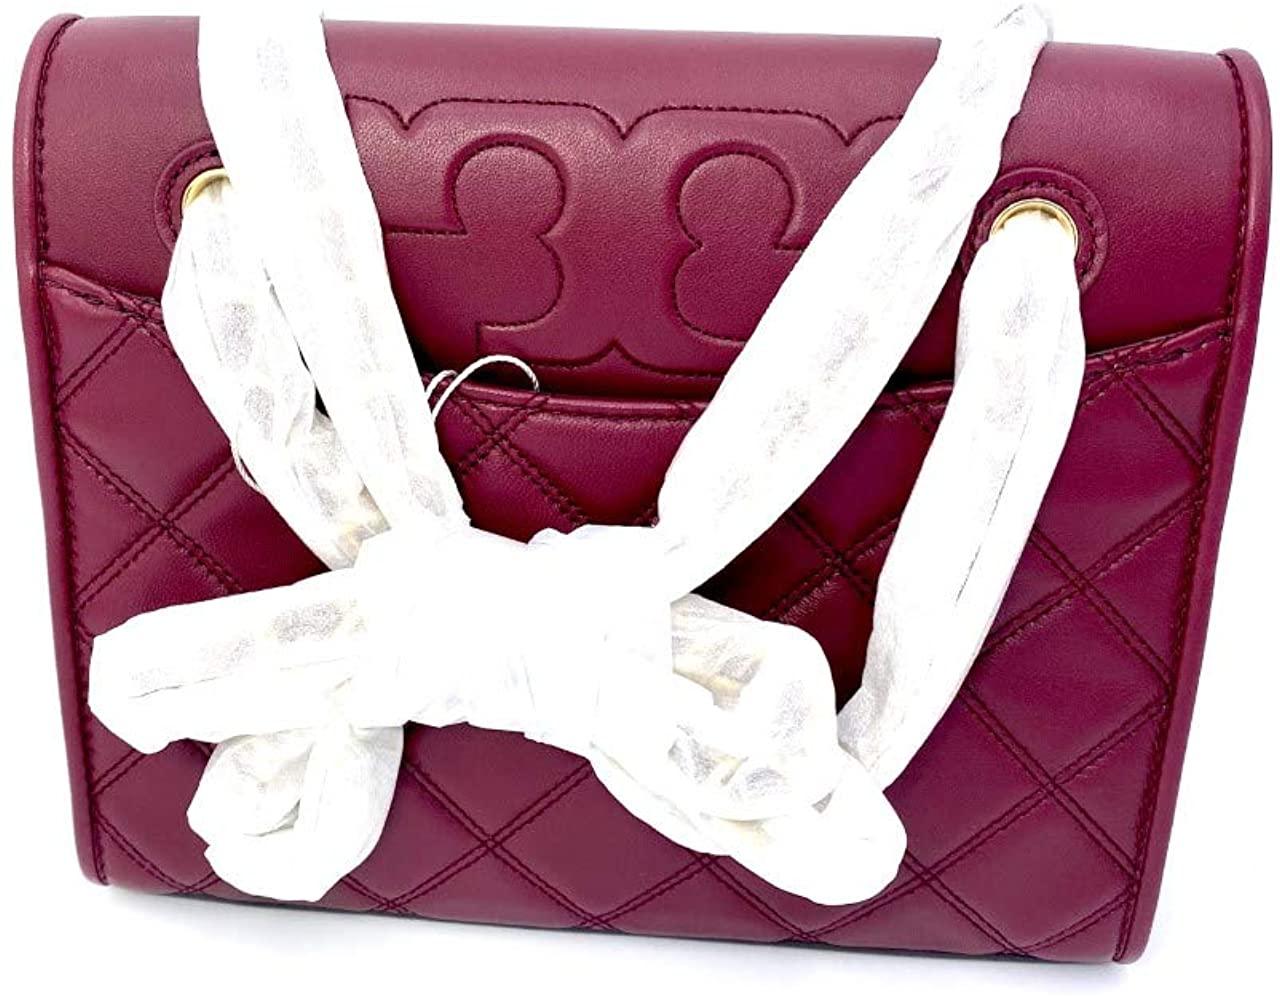 Tory Burch 64142-609 Imperial Garnet Savannah Convertible Women's Shoulder Bag